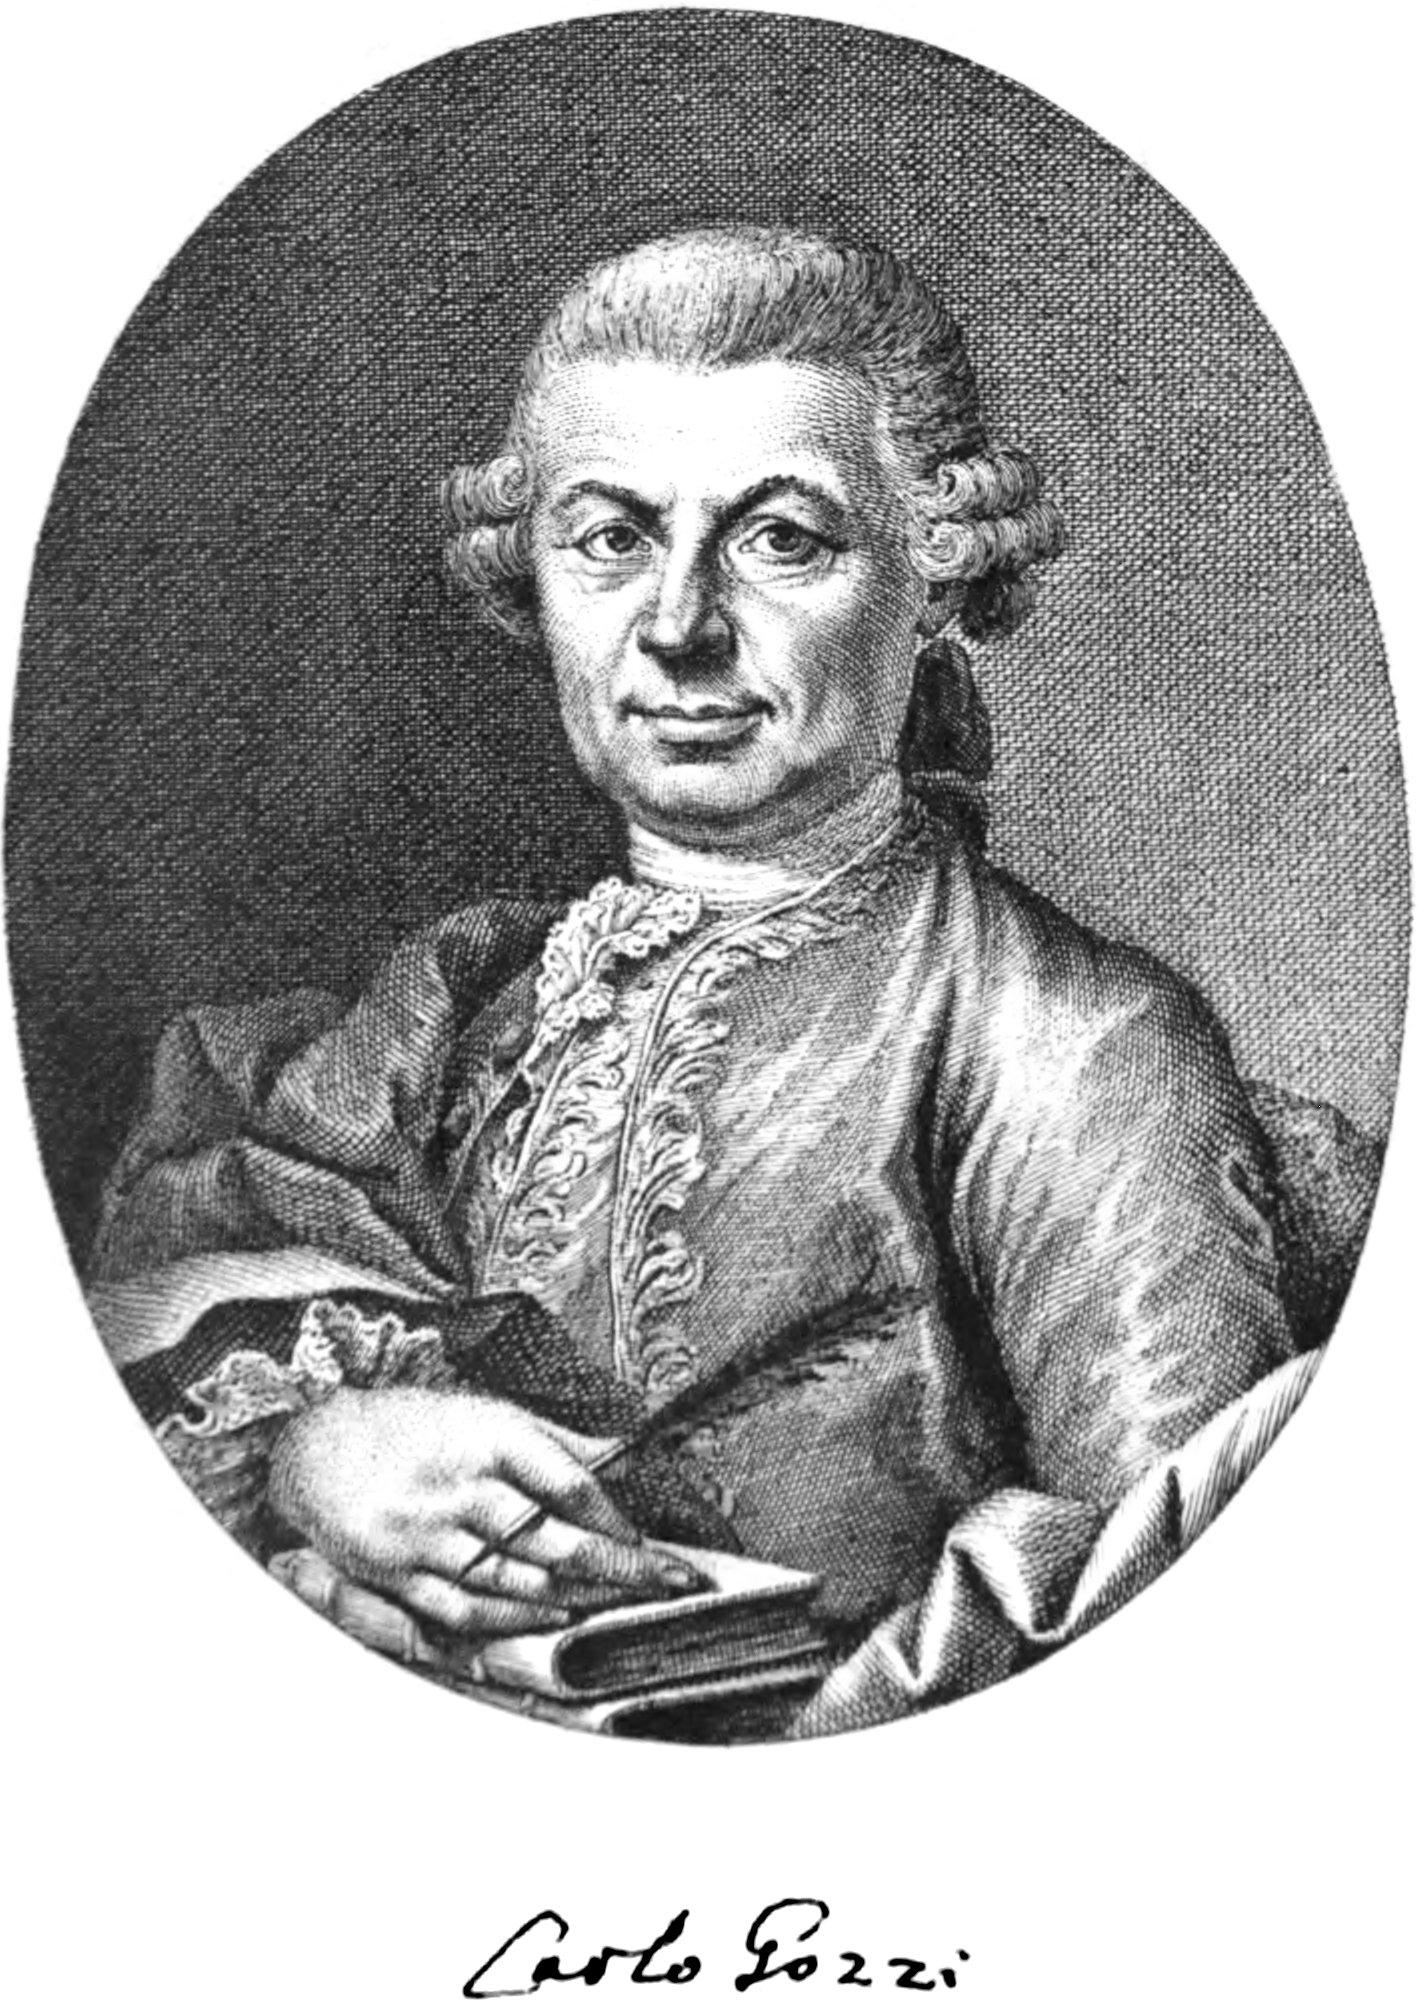 Portrait of Carlo Gozzi